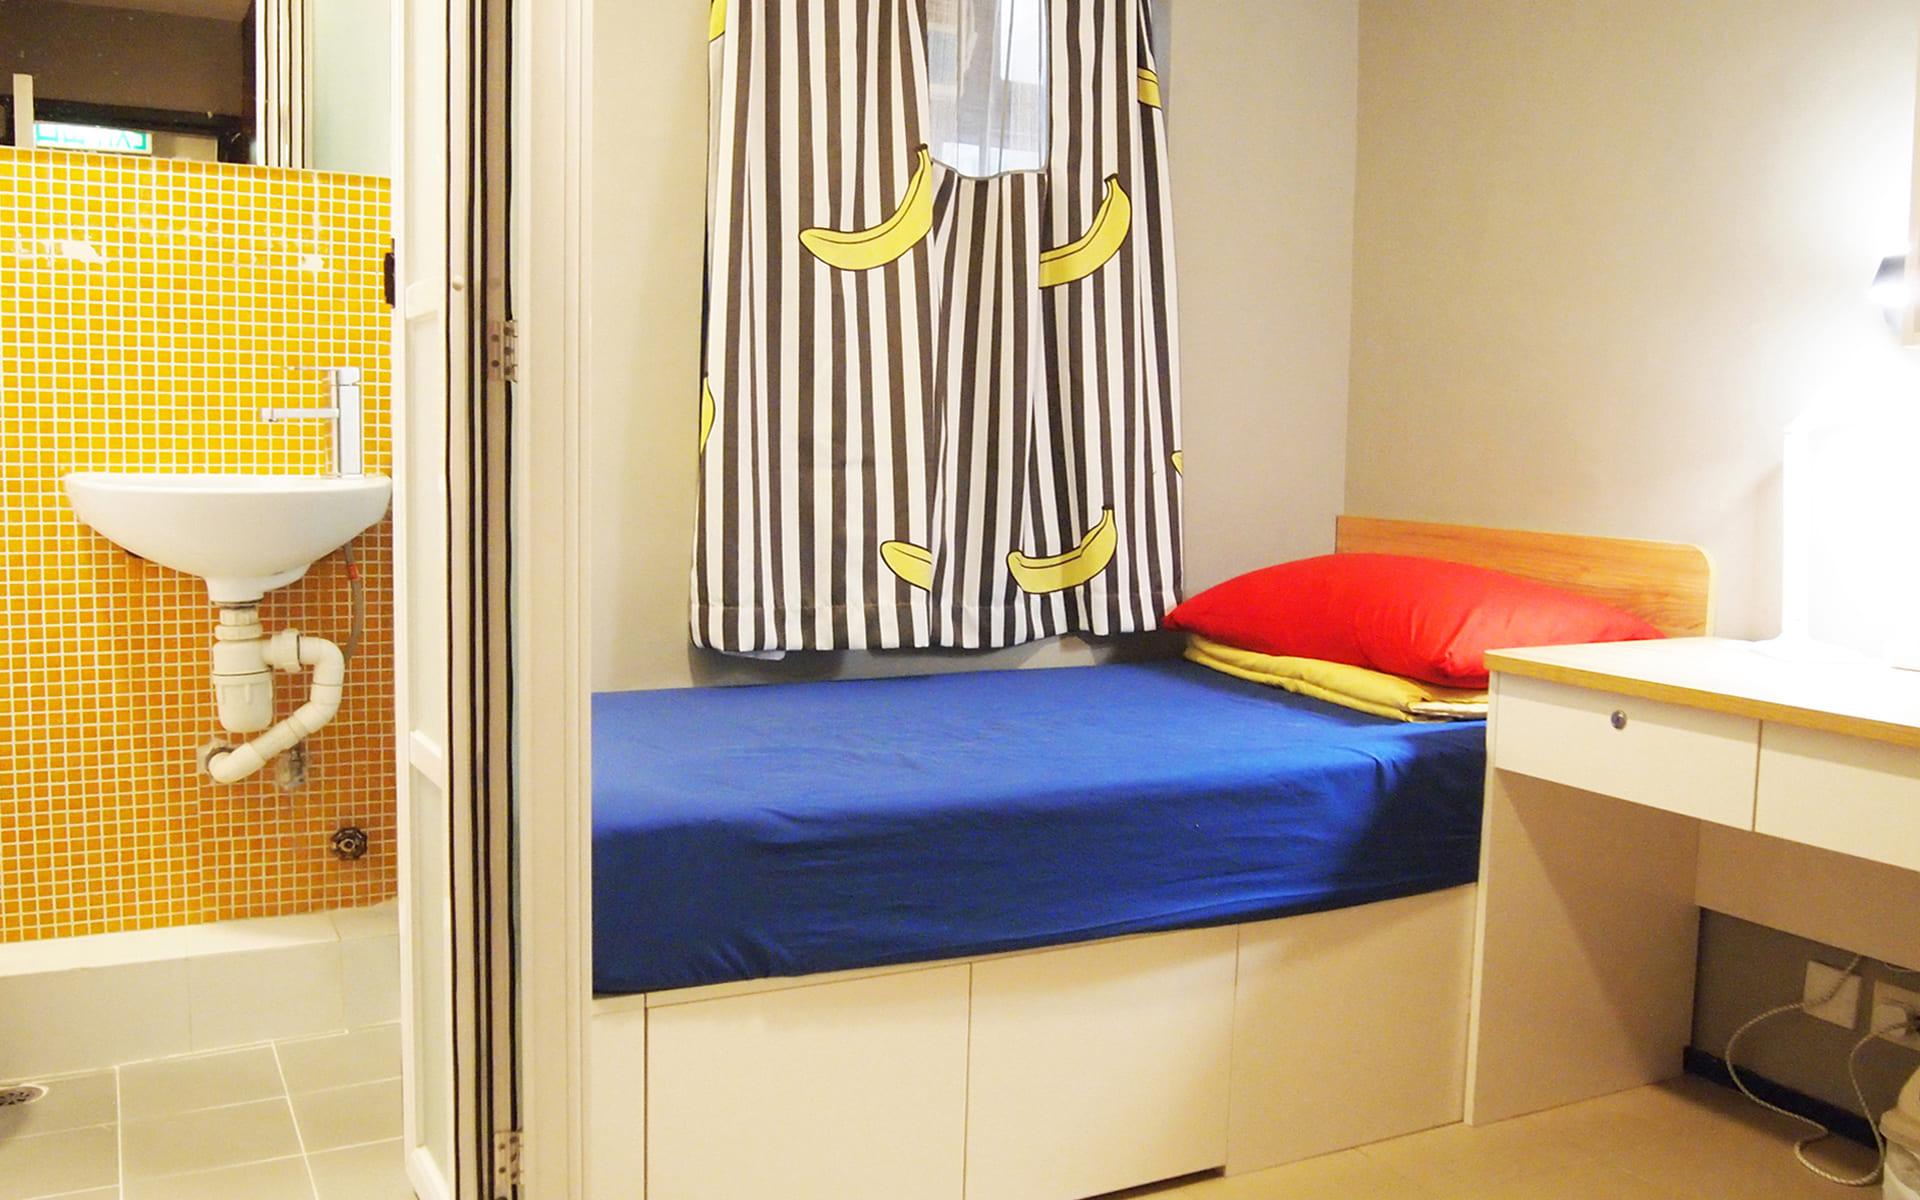 hk_service_apartment_10973931121596709975.jpg